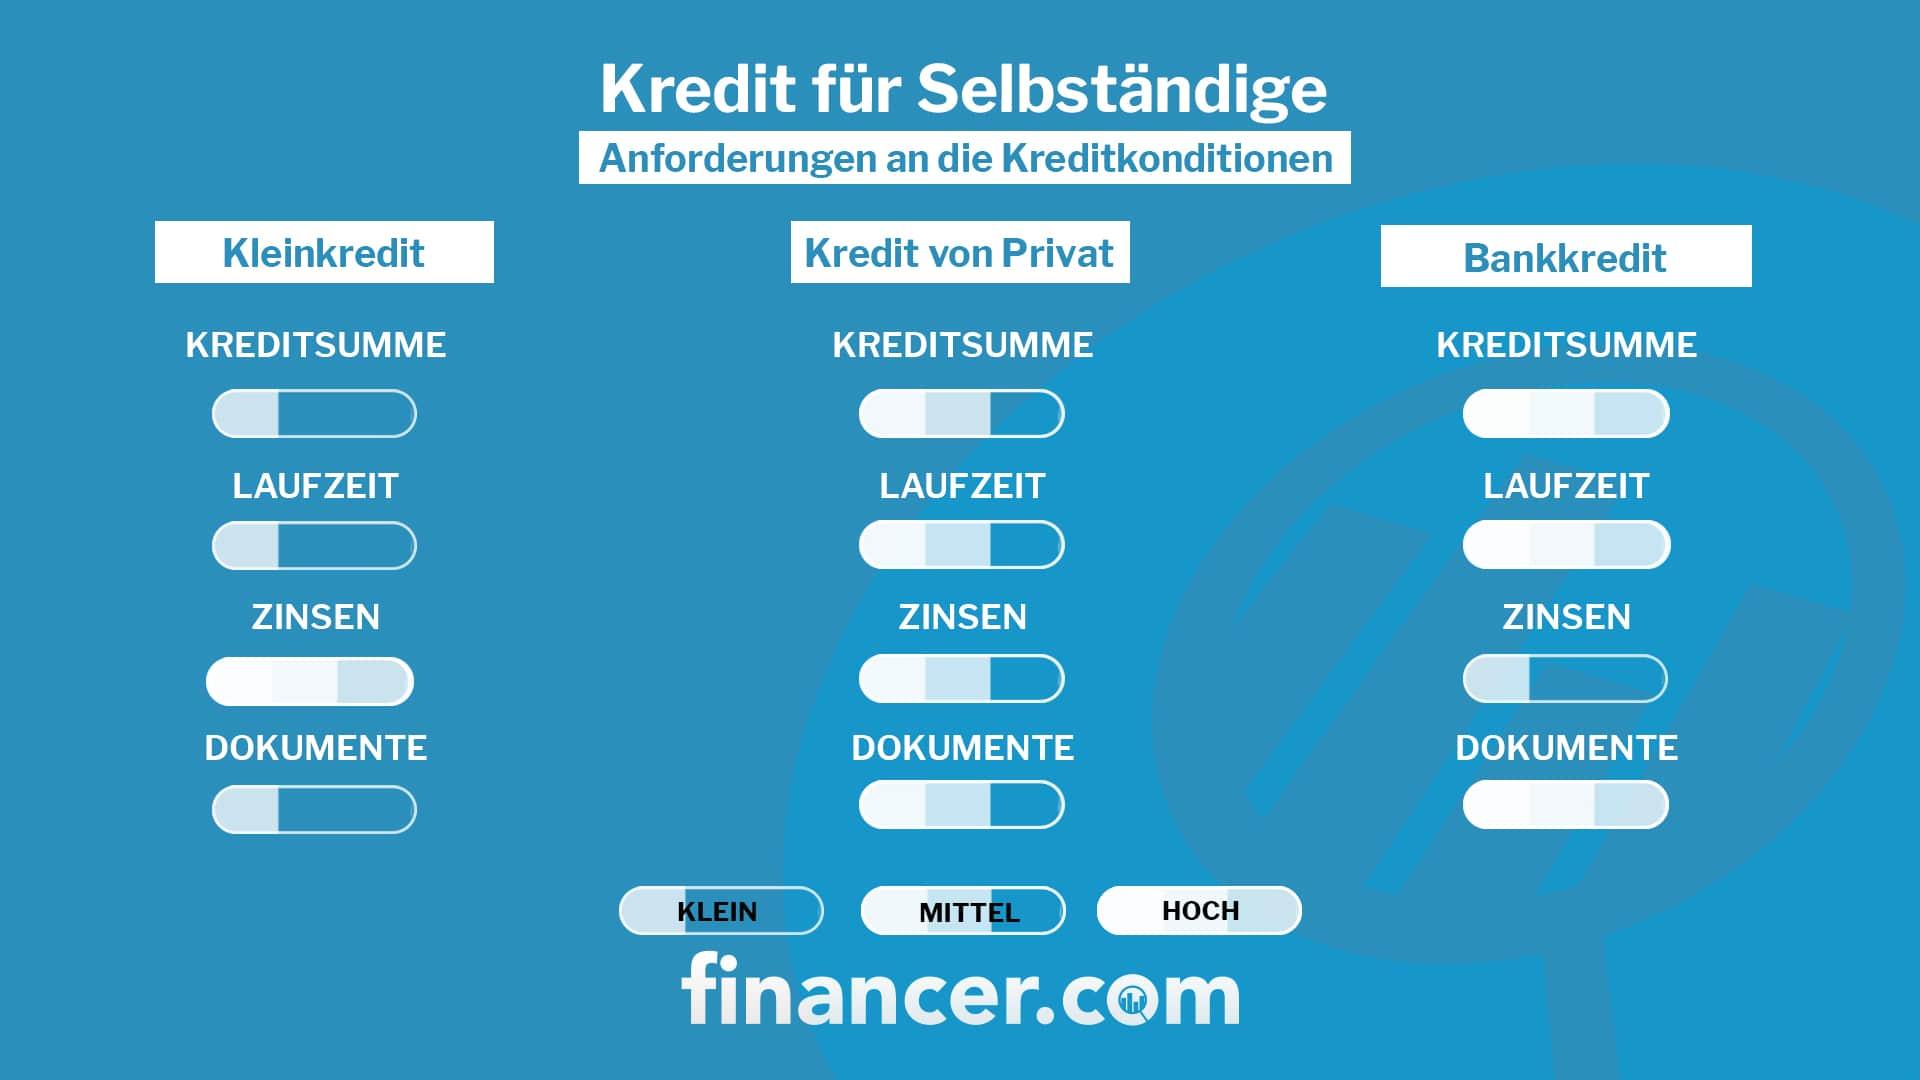 Seriöse Kreditgeber